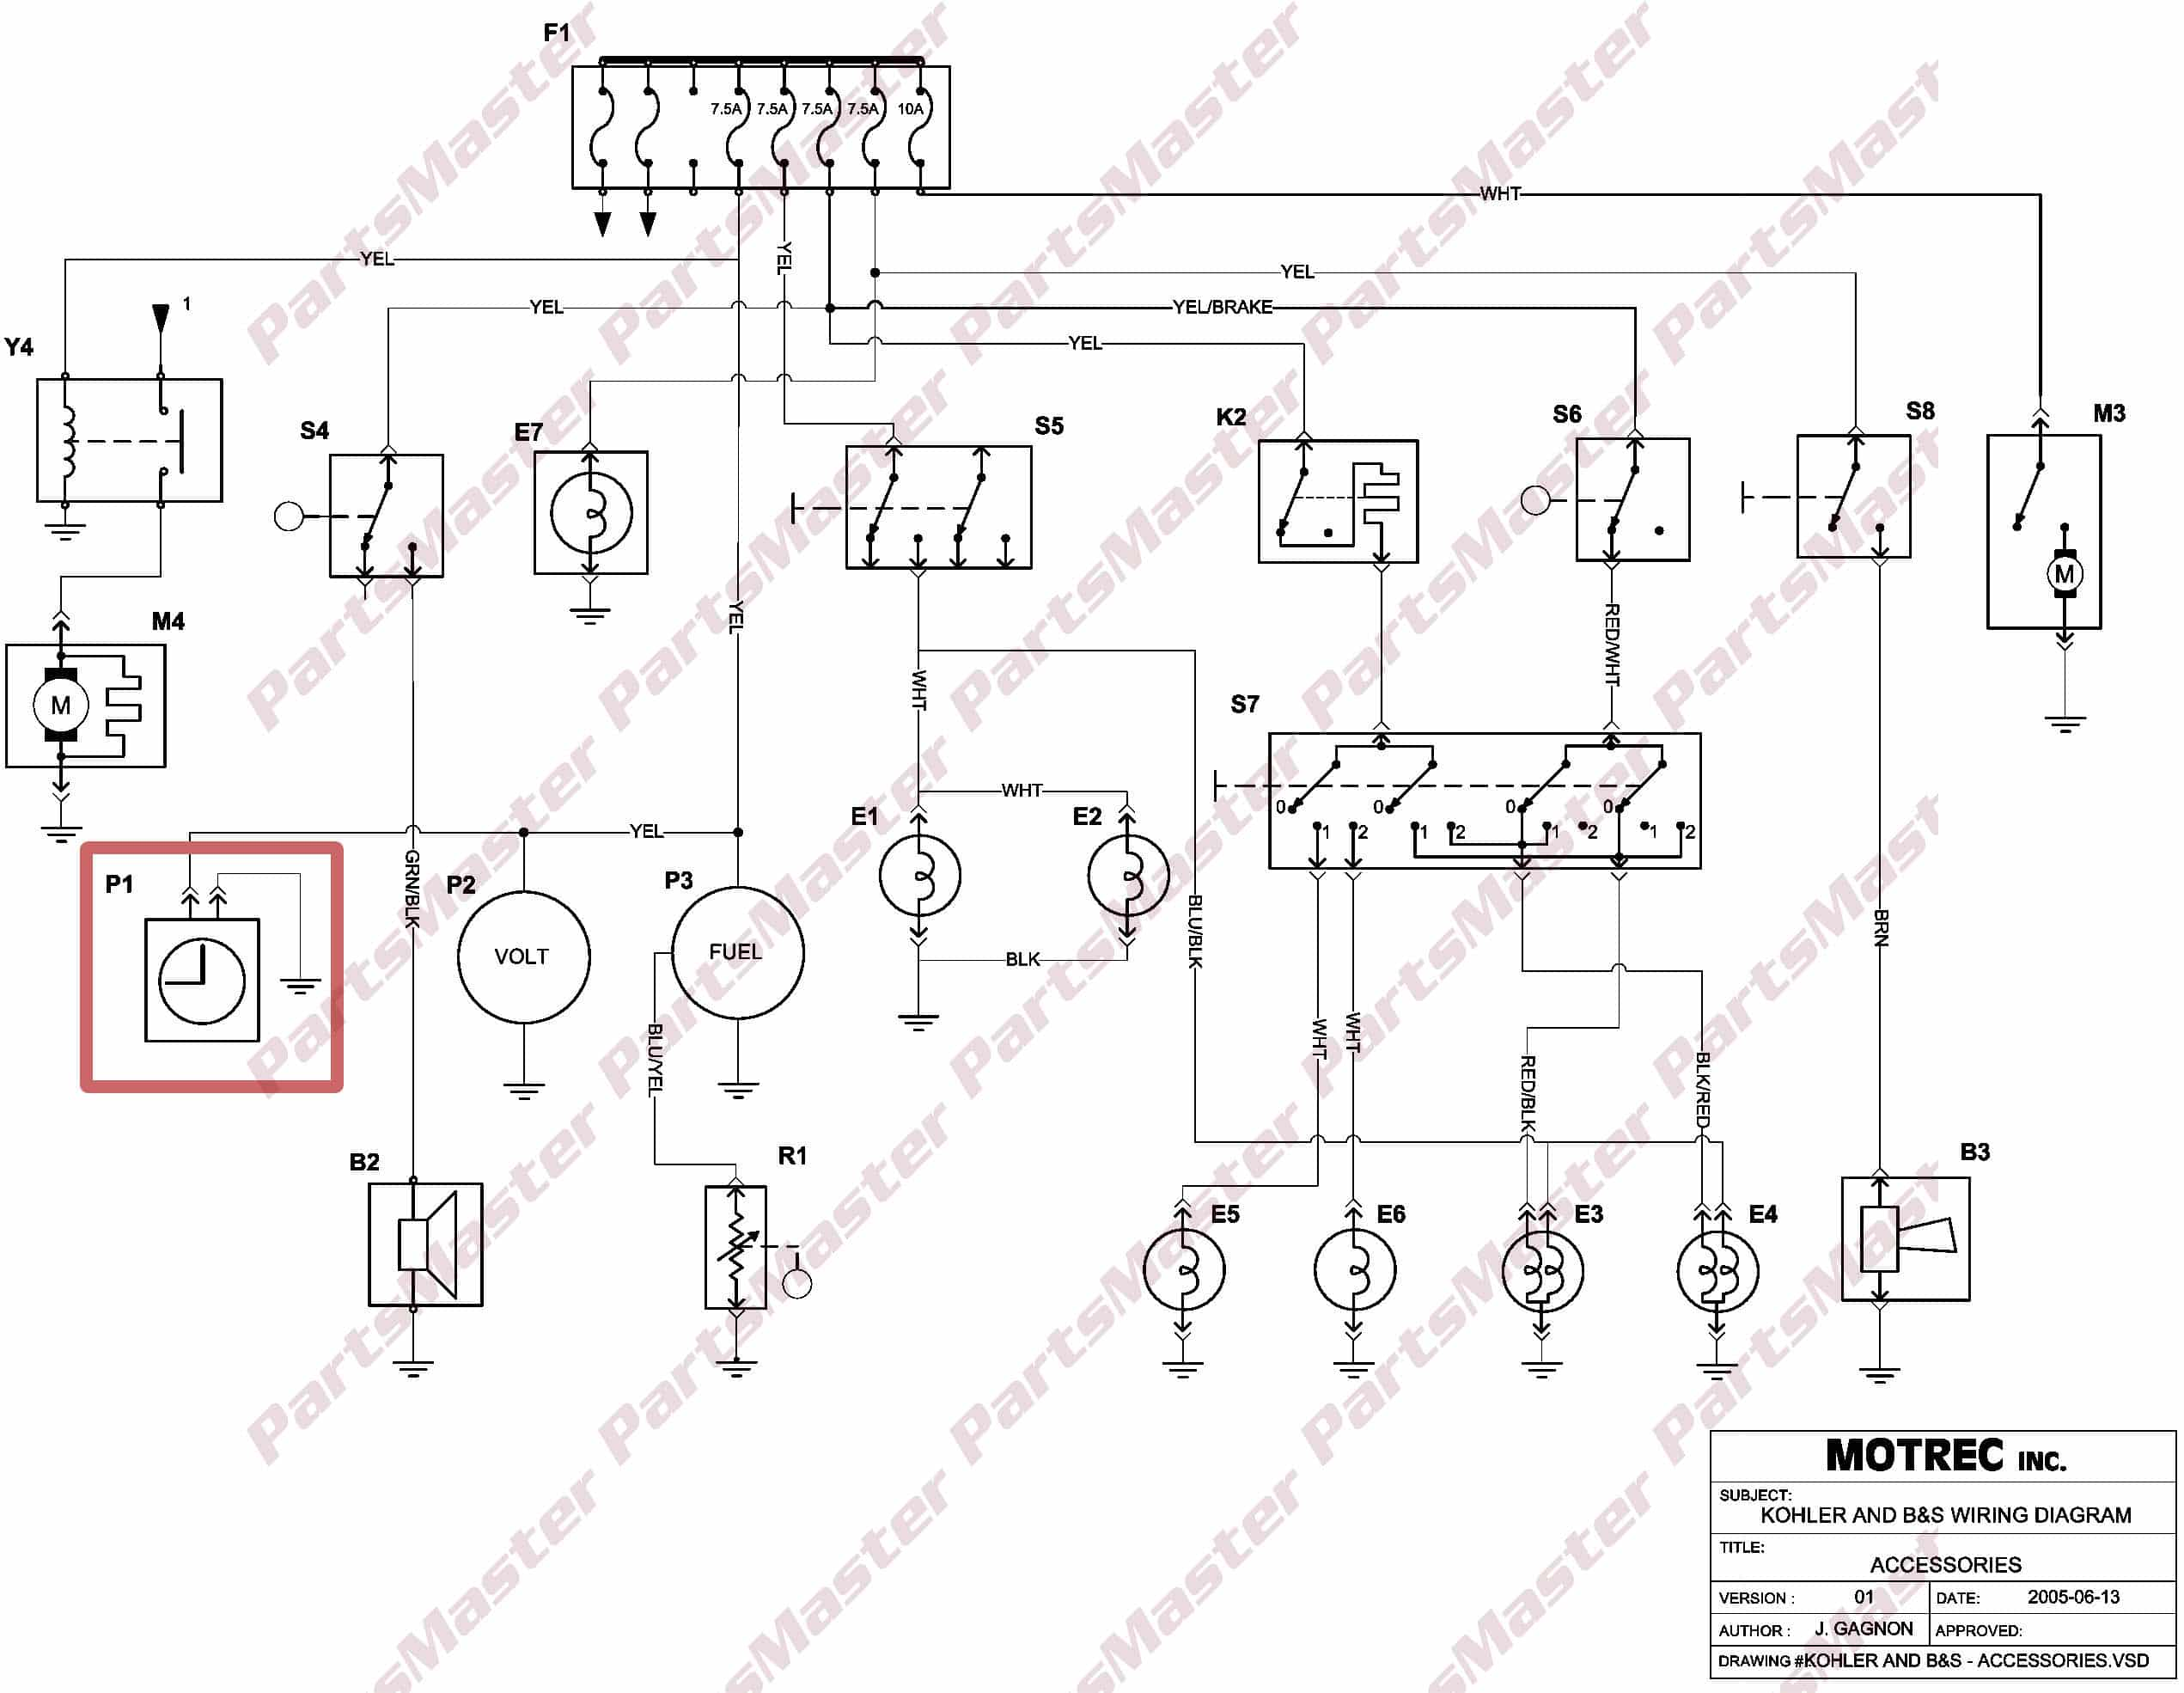 S14 Wiring Diagram Cab Wiring Circuit \u2022 Blue Bird Alternators Bluebird  Wiring Diagrams